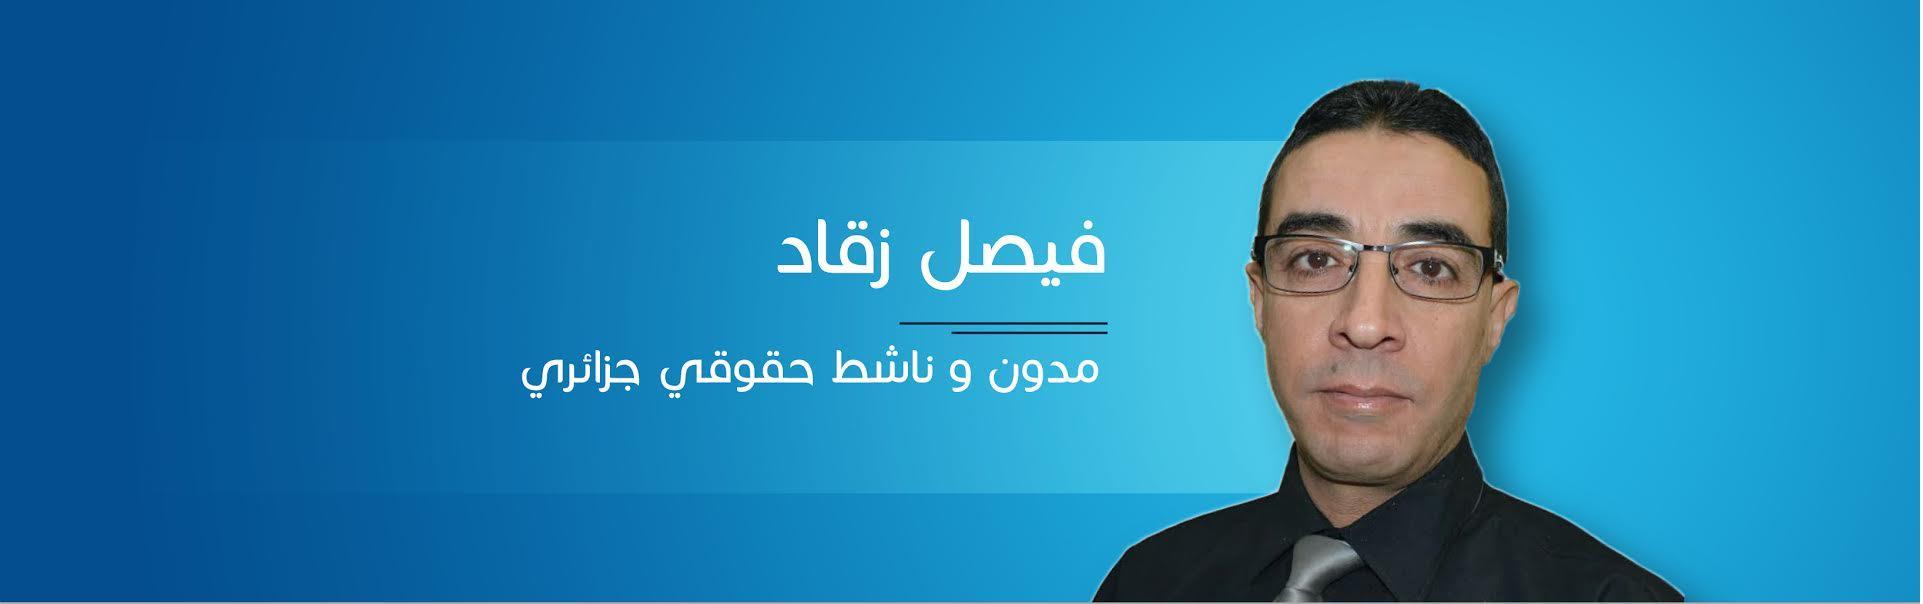 Photo of عندما يصادر صوت الشعب الجزائري ..!